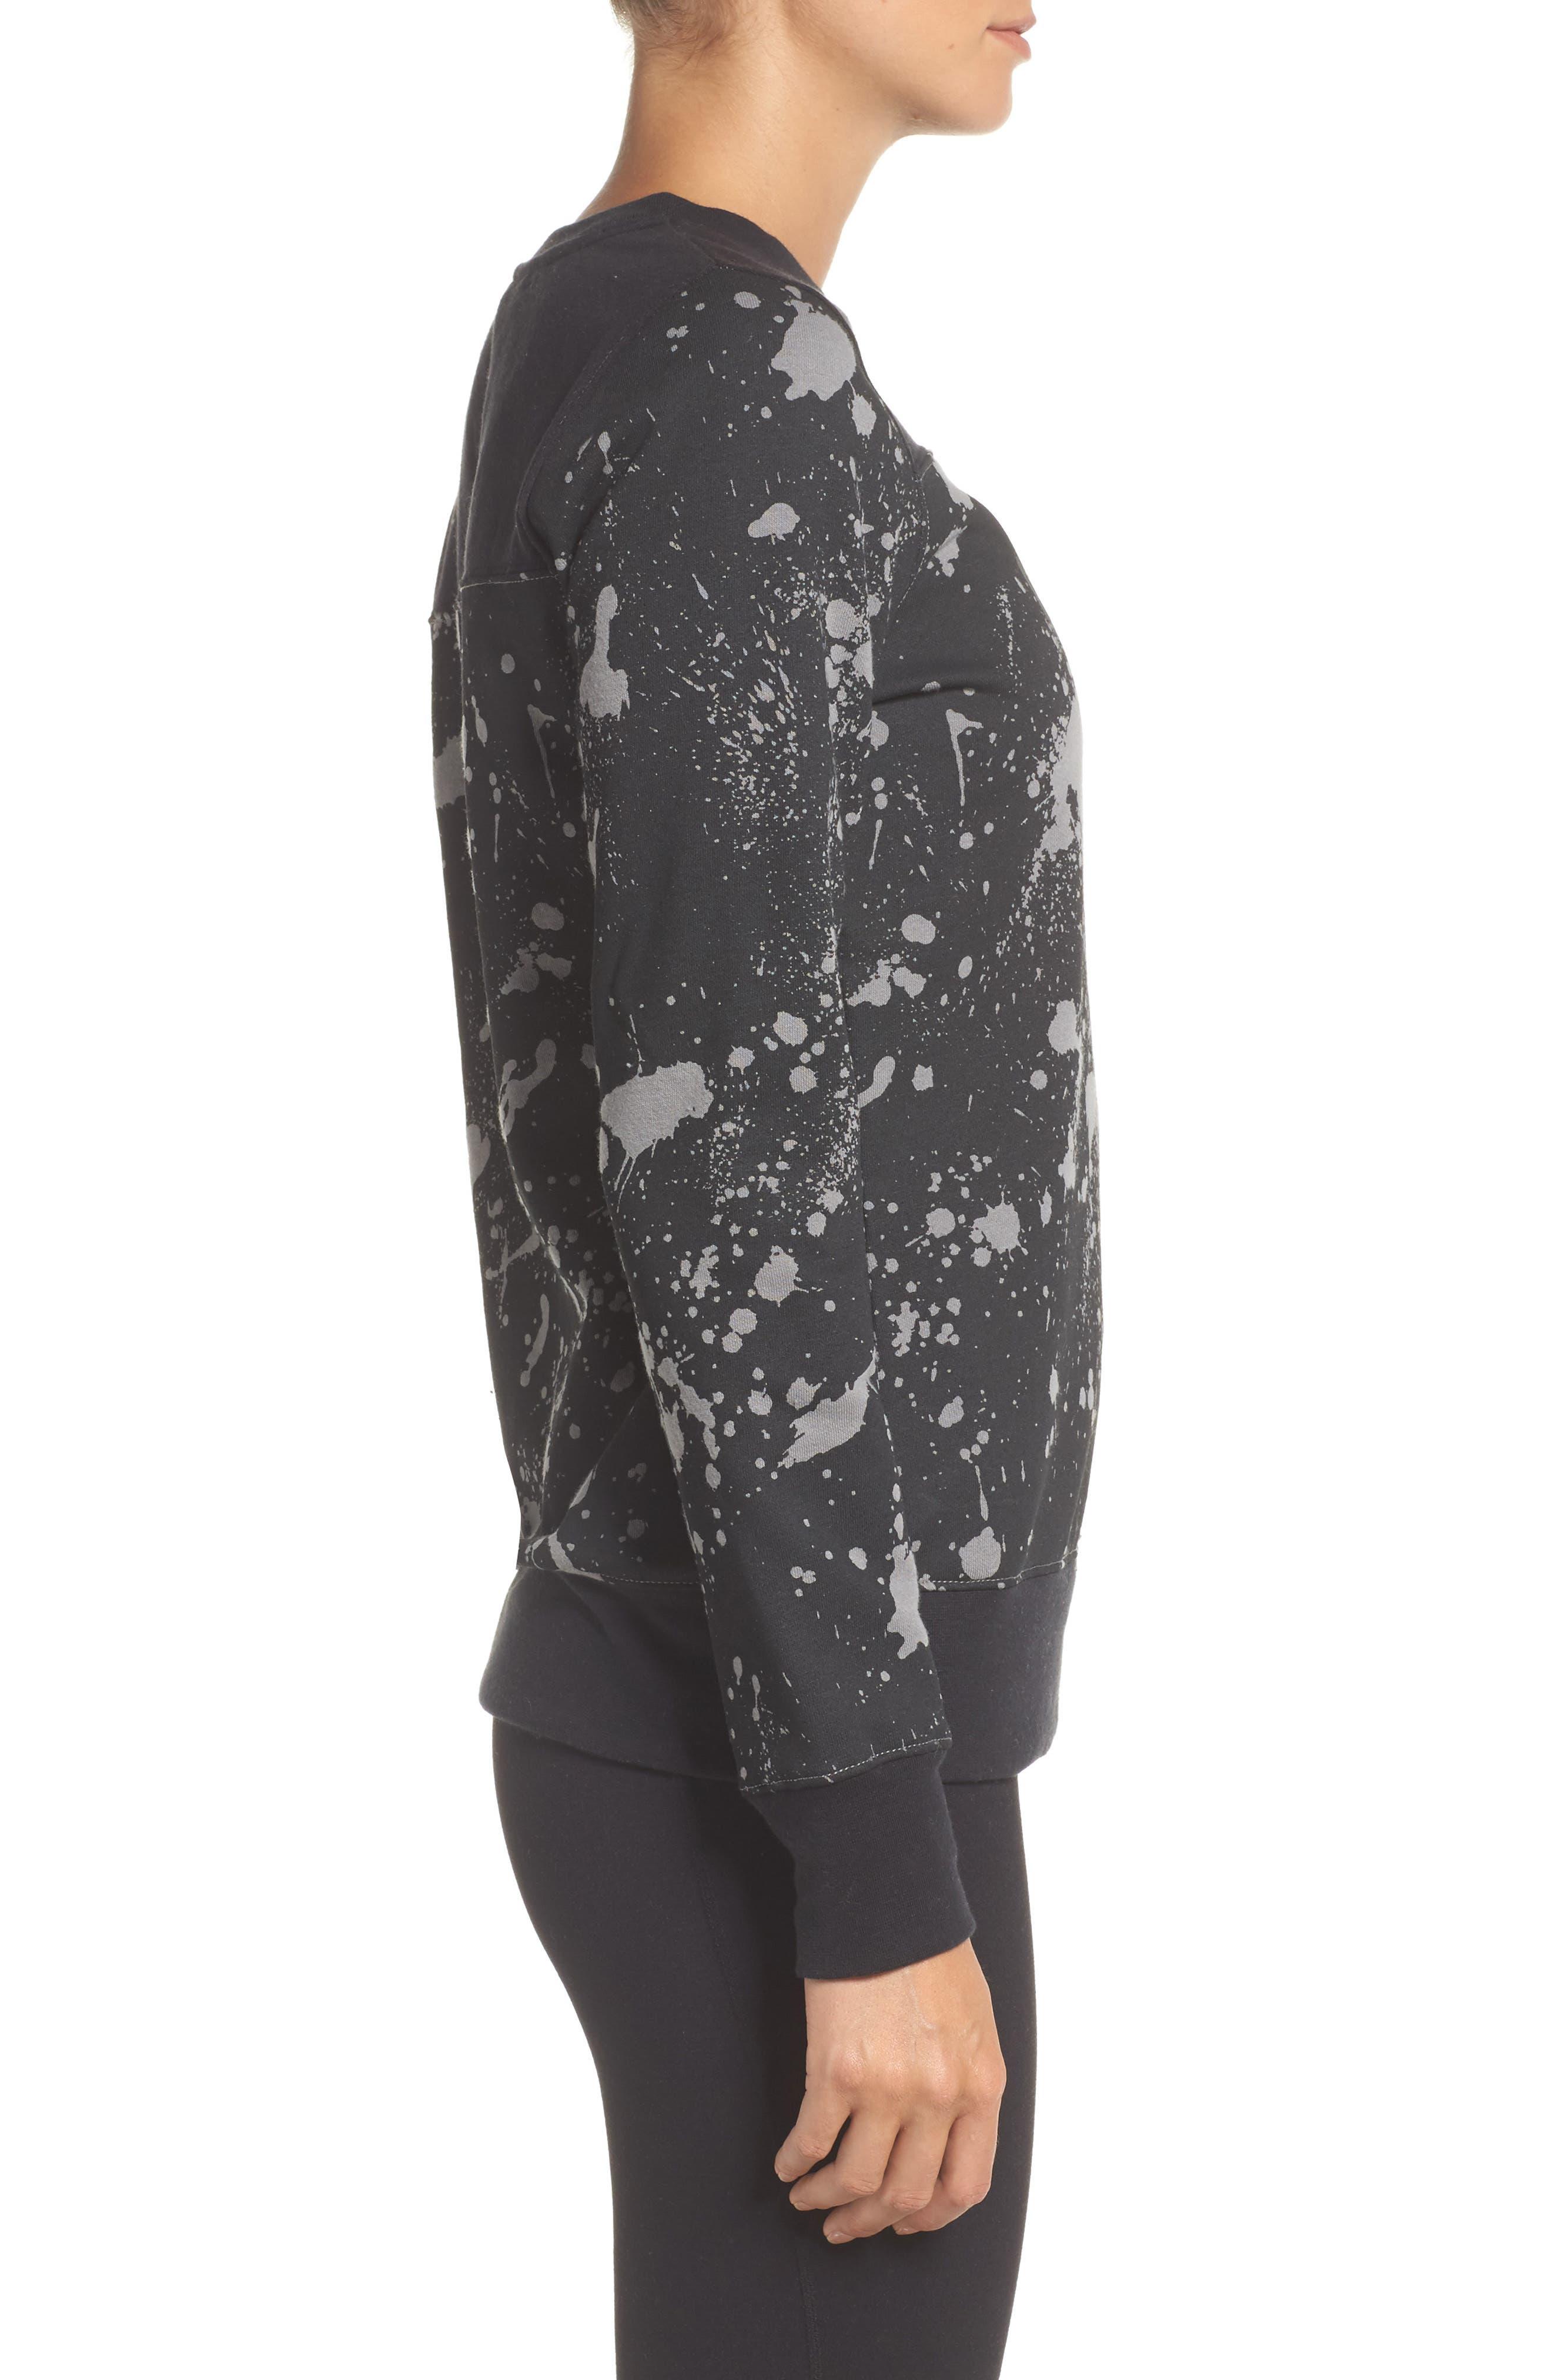 Half Dome Sweatshirt,                             Alternate thumbnail 3, color,                             Tnf Black Splatter Print